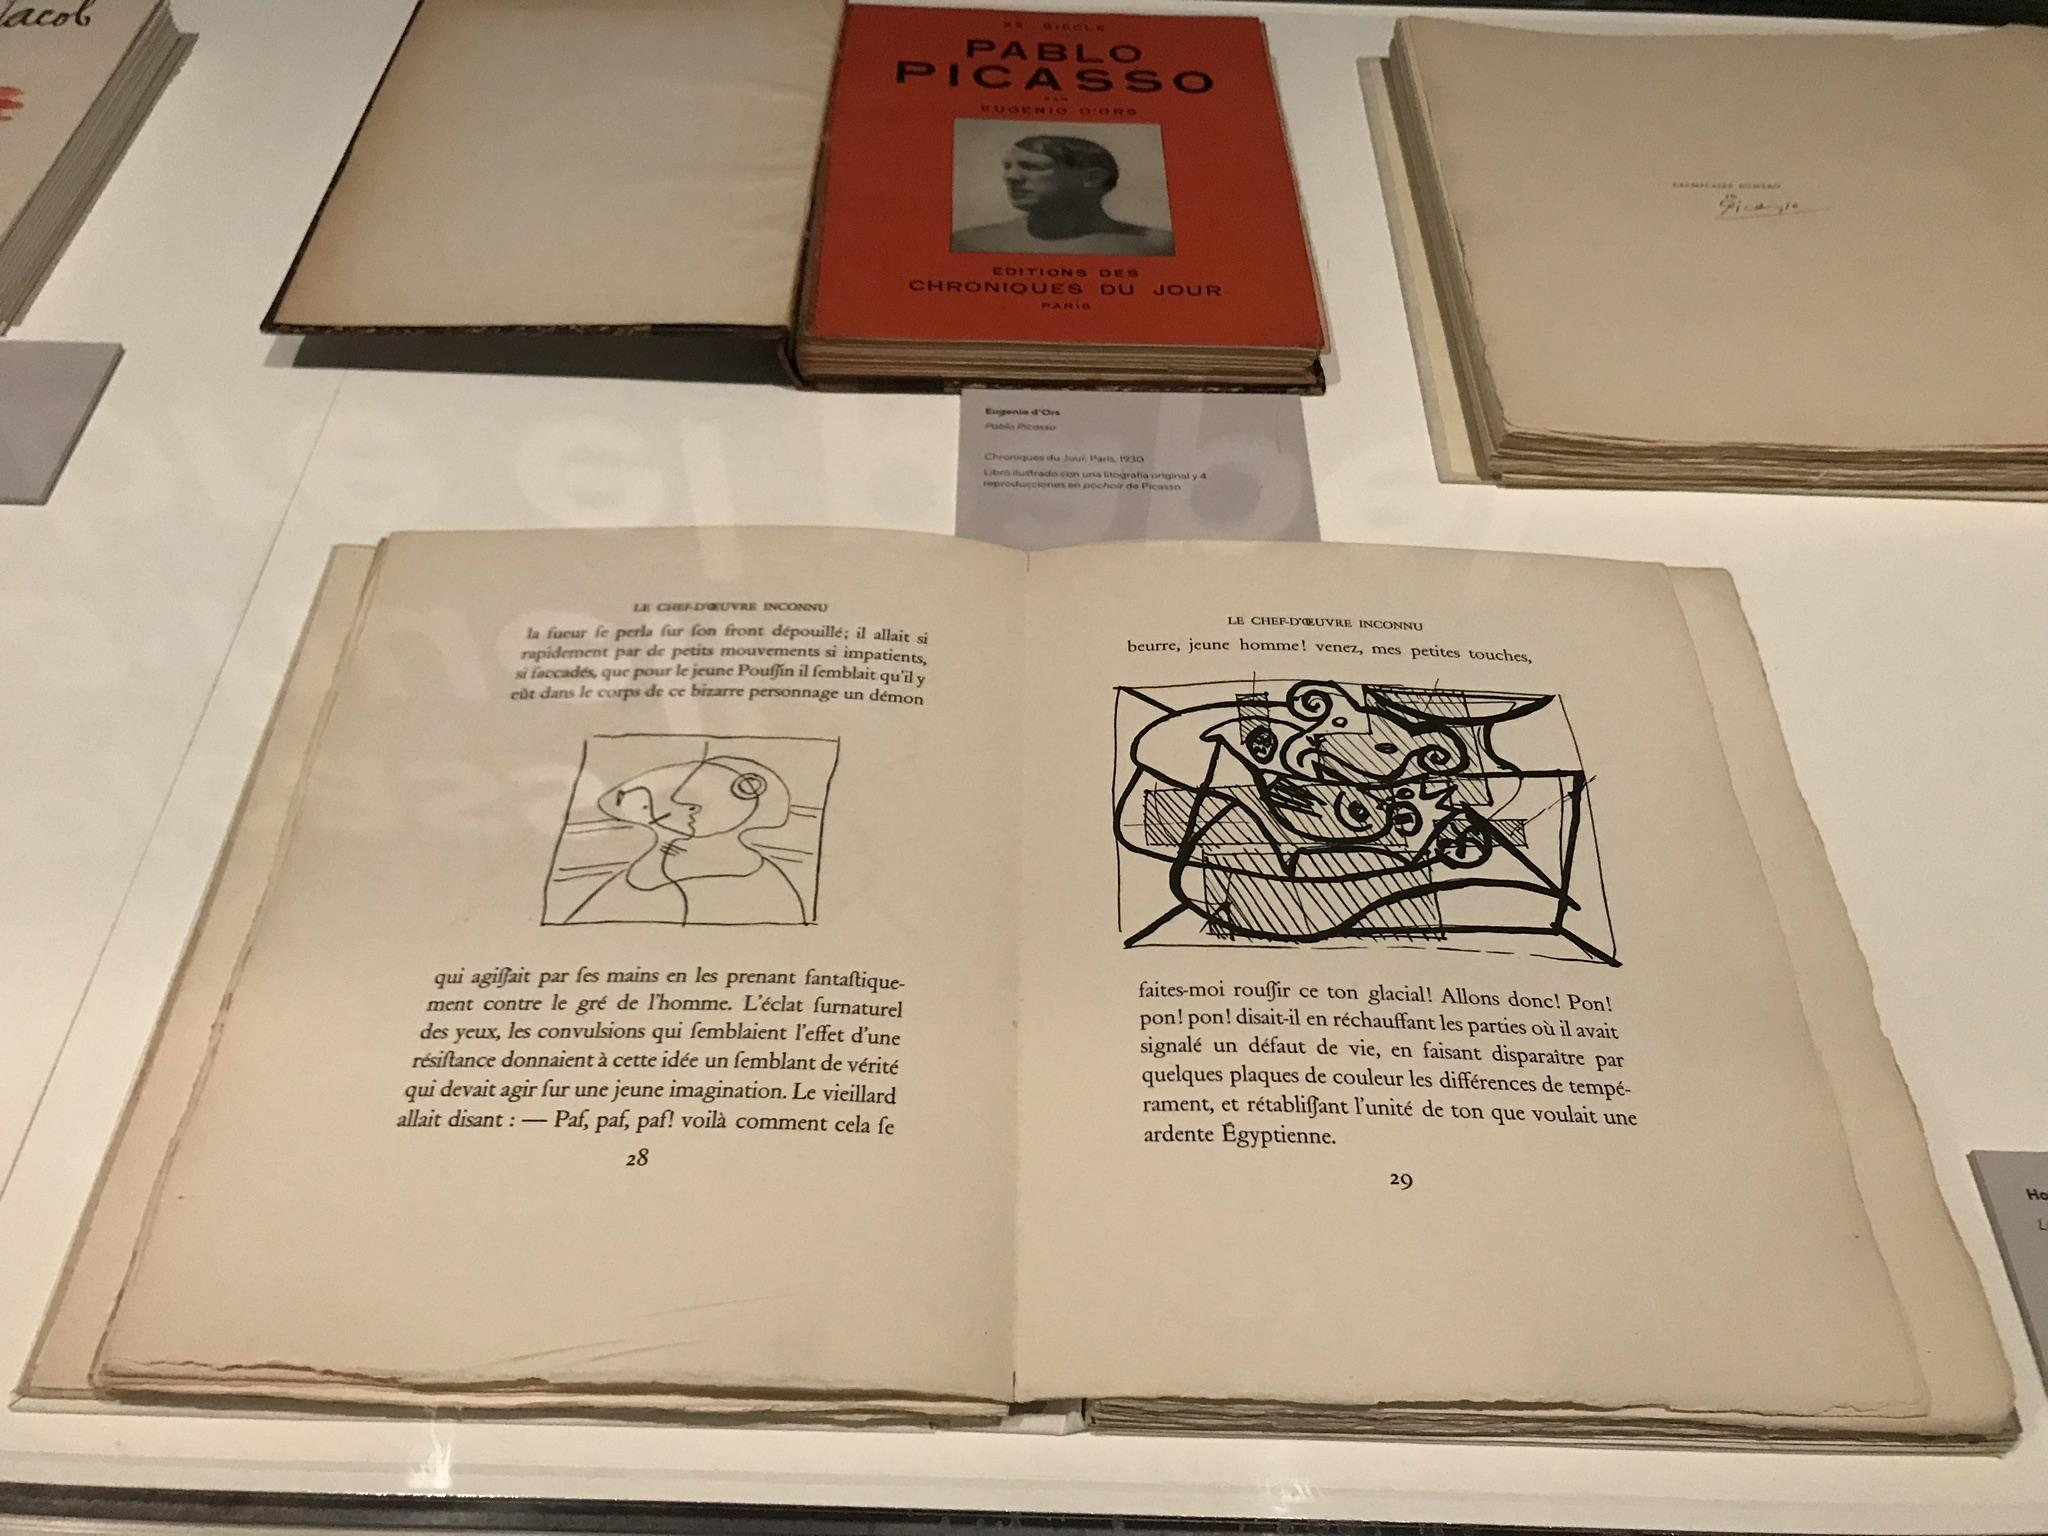 Libri casa natale Picasso malaga - aspassoperlaspagna.it